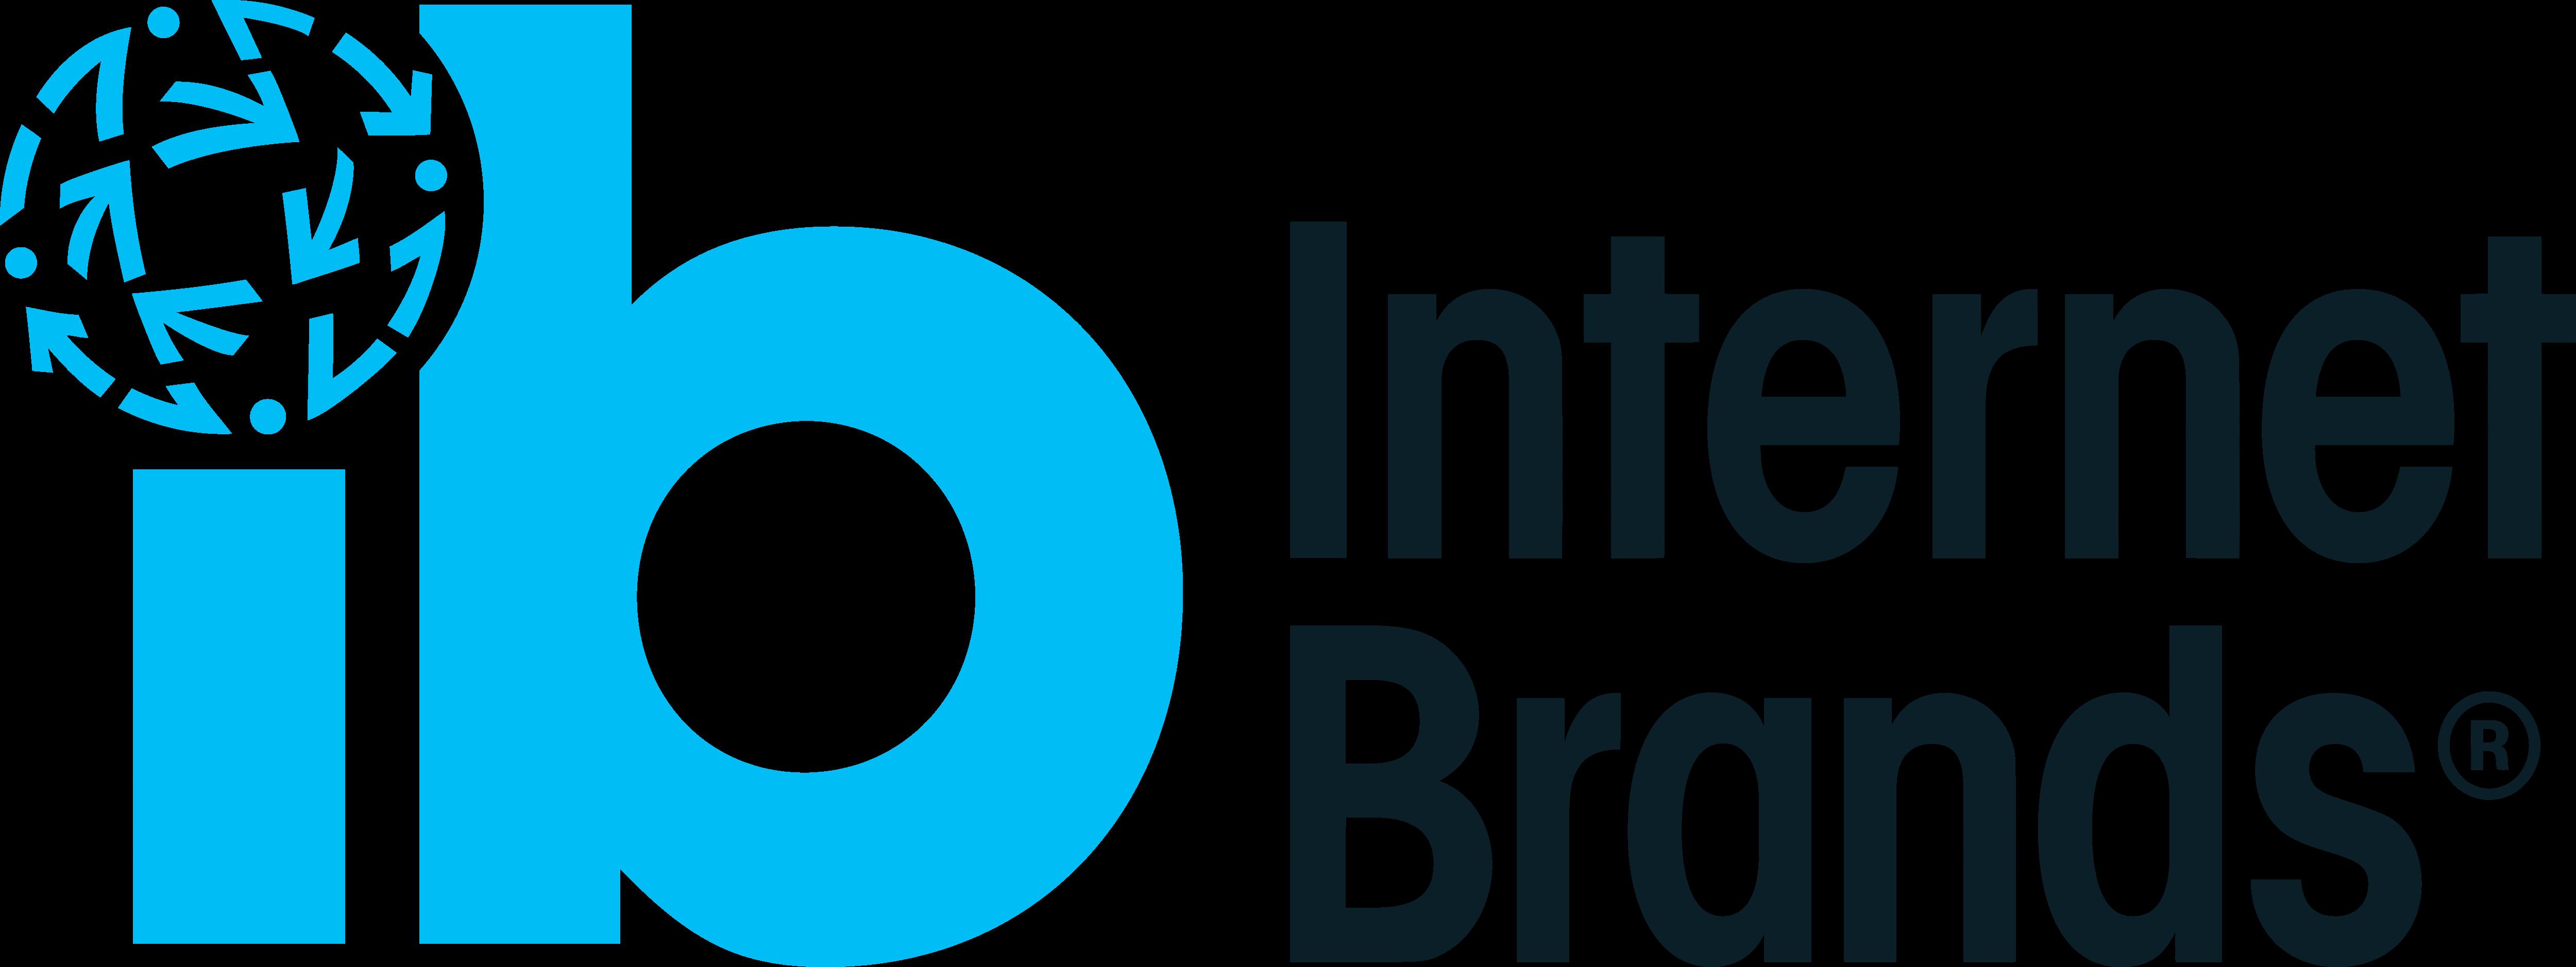 Internet Brands - Logos Download